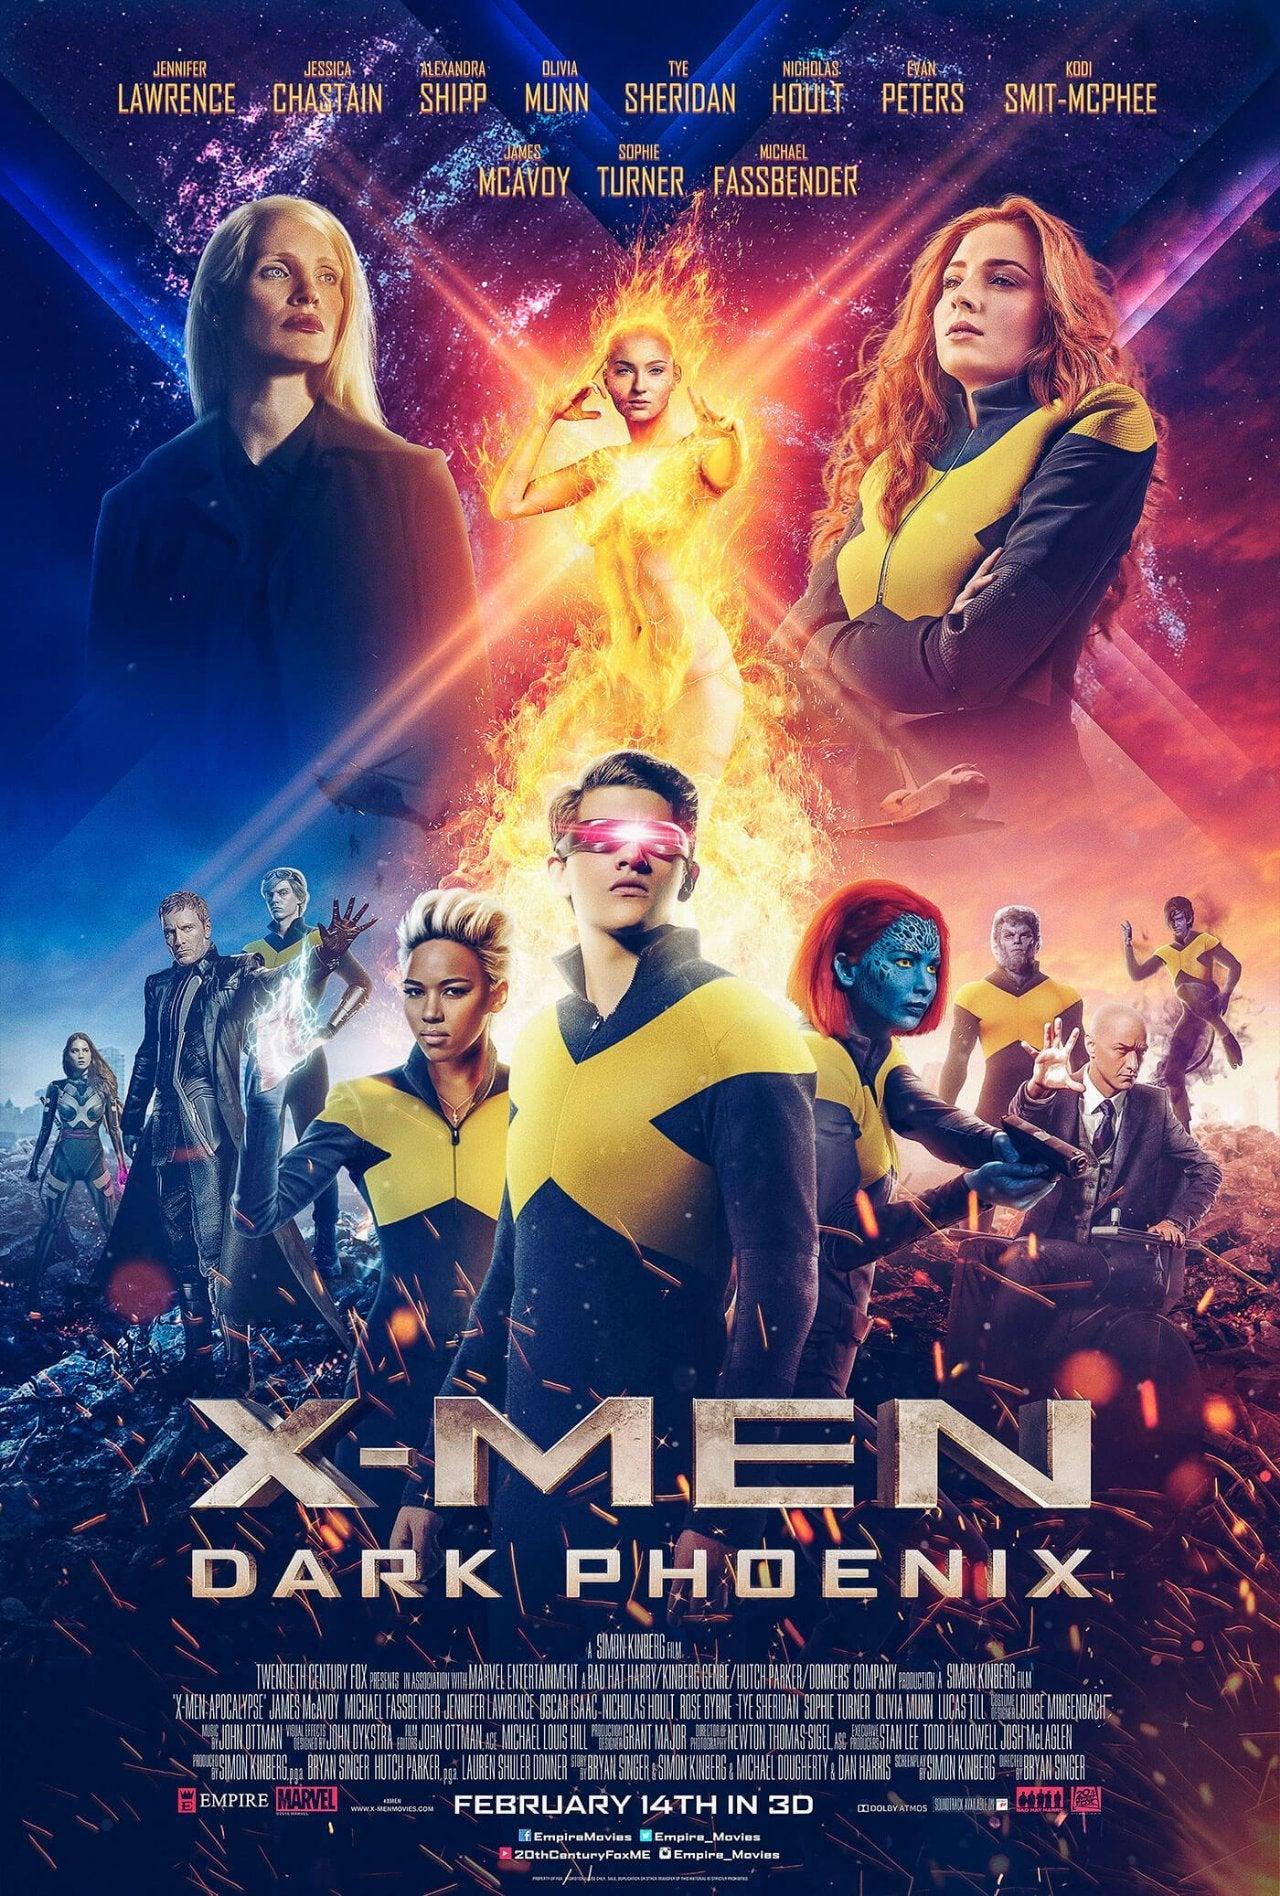 Image result for dark phoenix movie poster